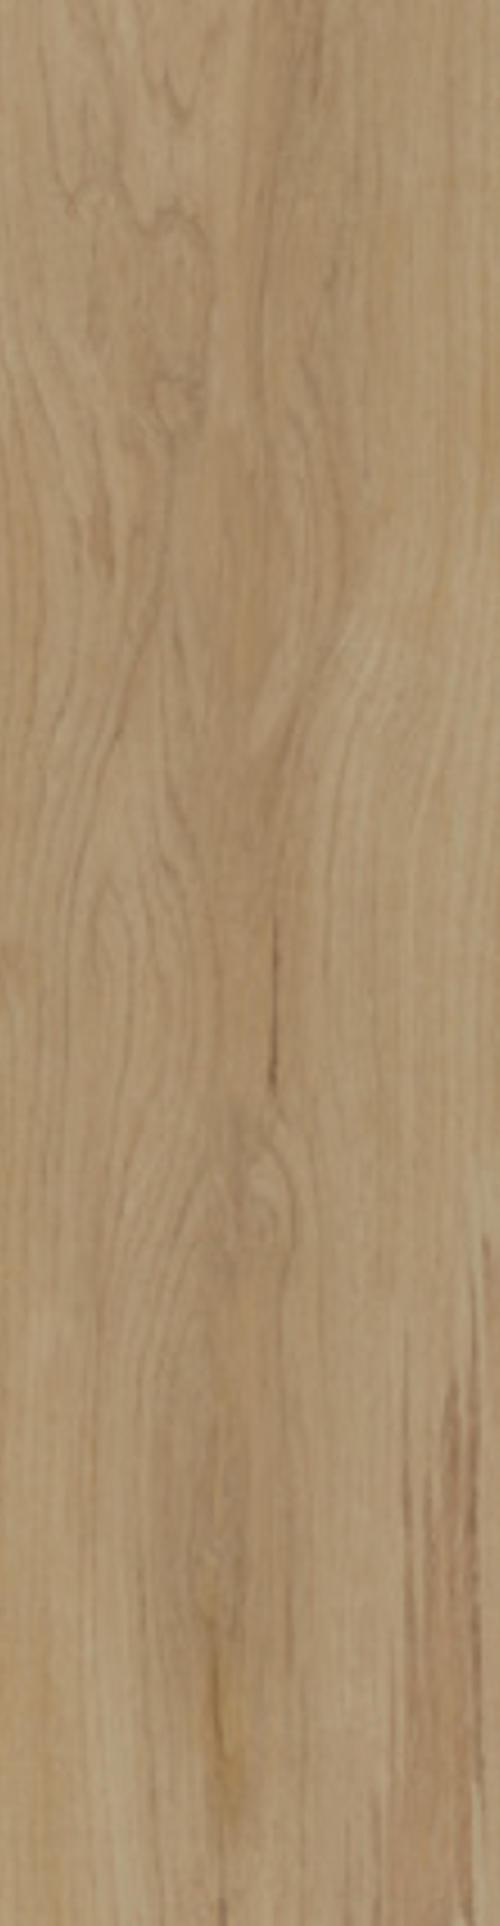 Гранитогрес Nicea brown 15.5x62